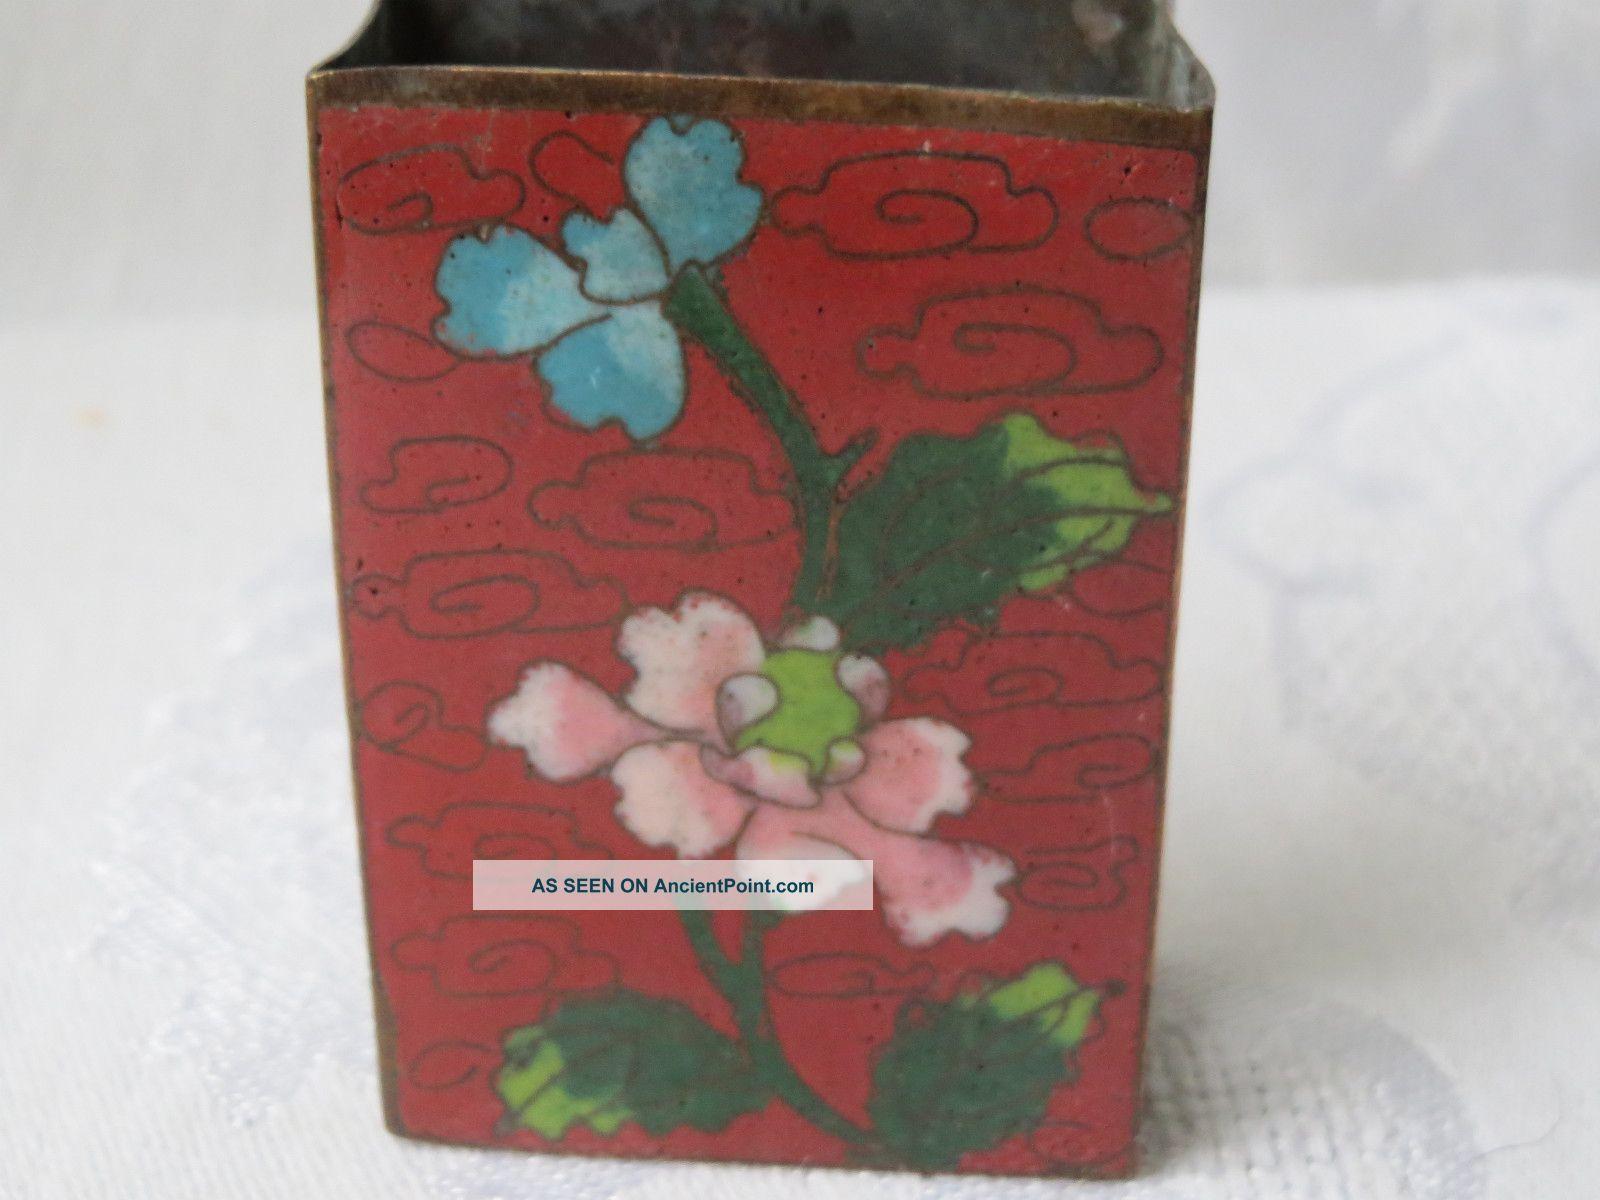 Antique Chinese Cloisonne Enamel Match Holder Safe Box Boxes photo